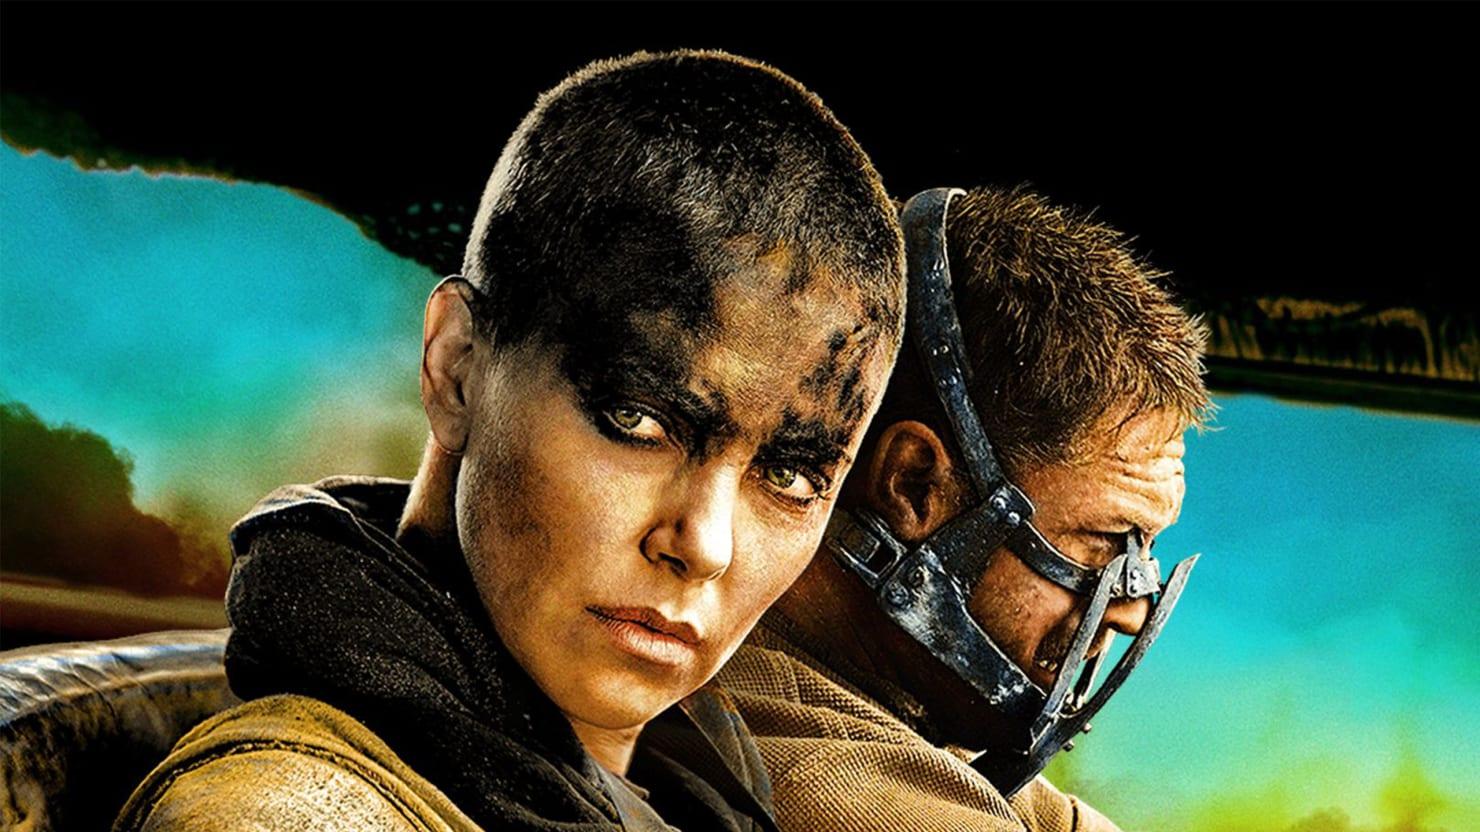 'Mad Max: Fury Road's' Feminine Mystique: A Dystopian Tale of Reproductive Rights